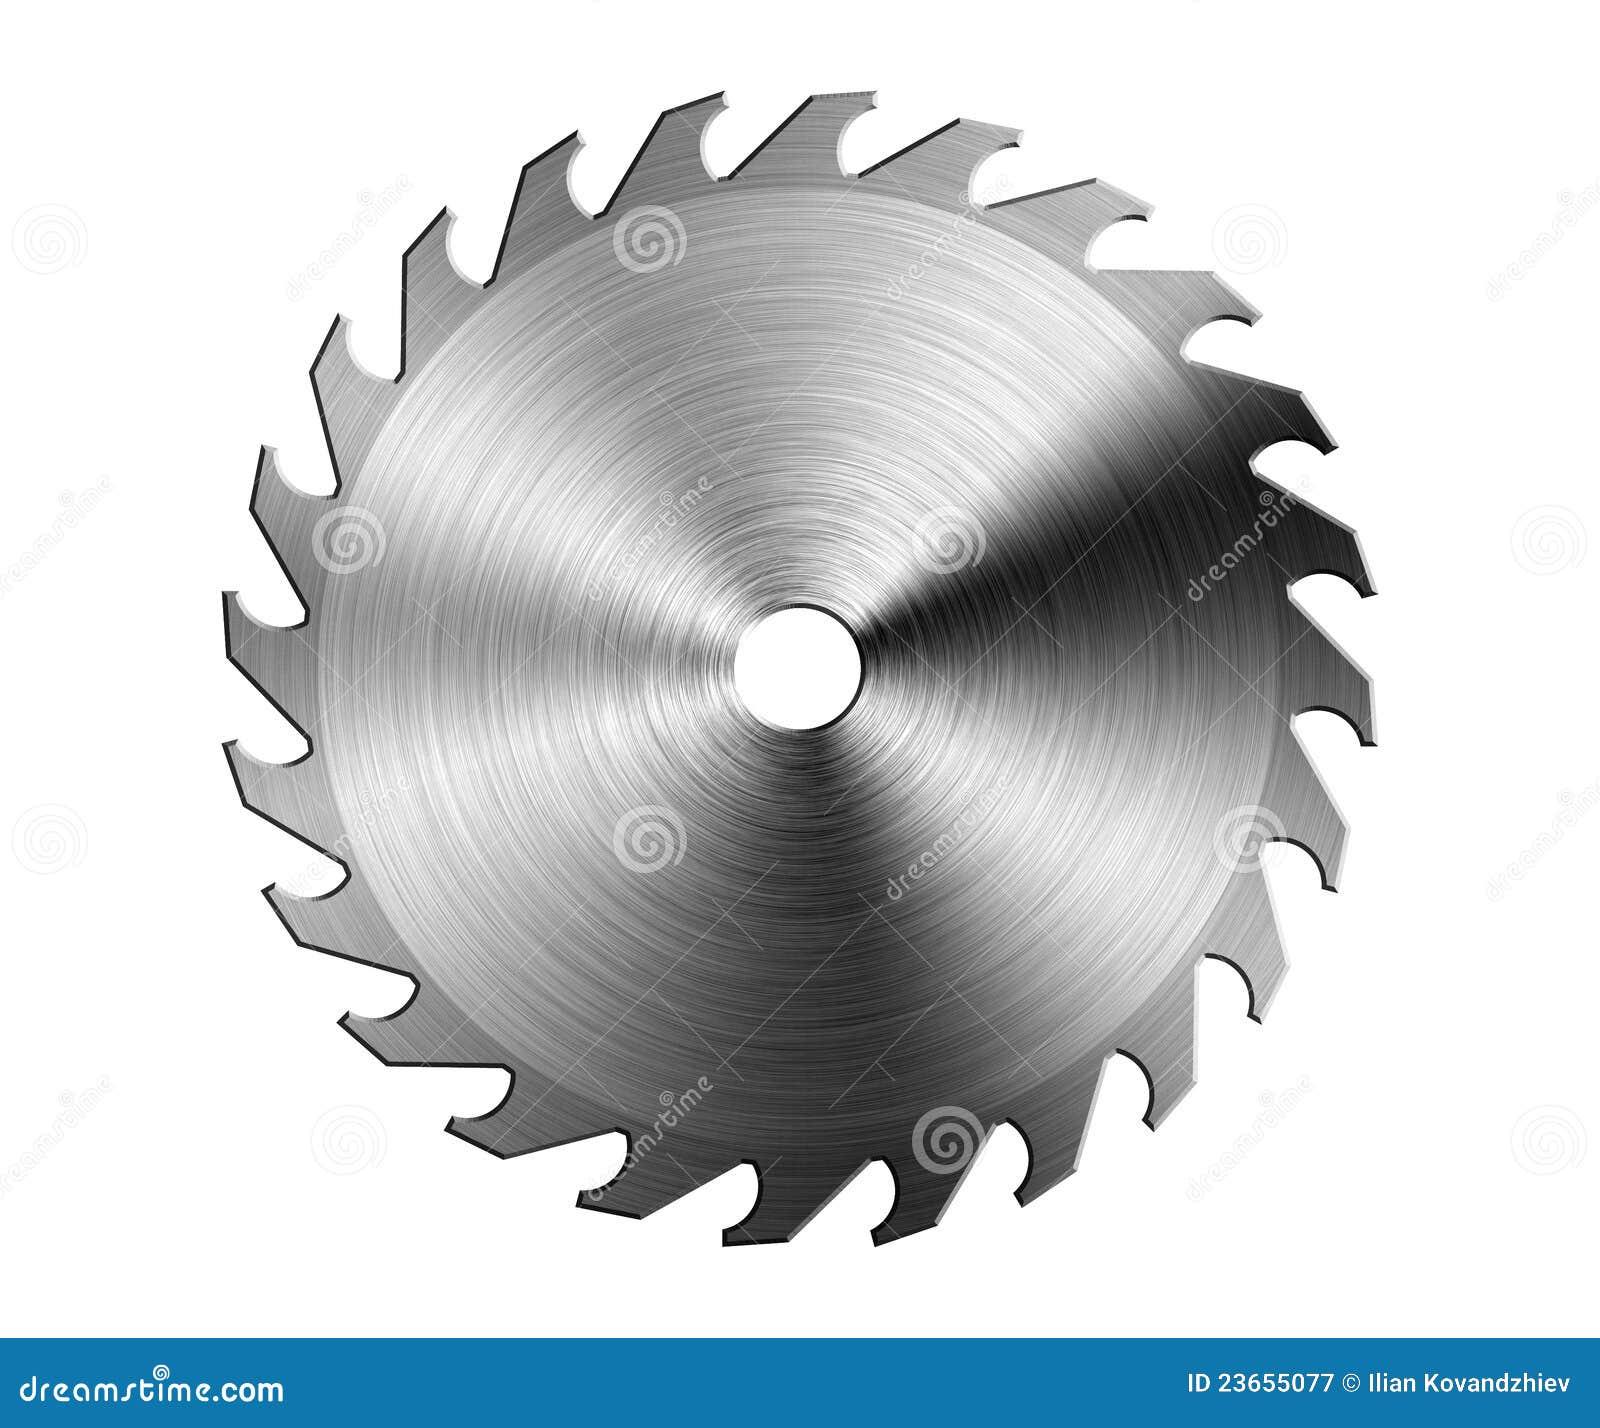 Circular saw blade 315 x 30